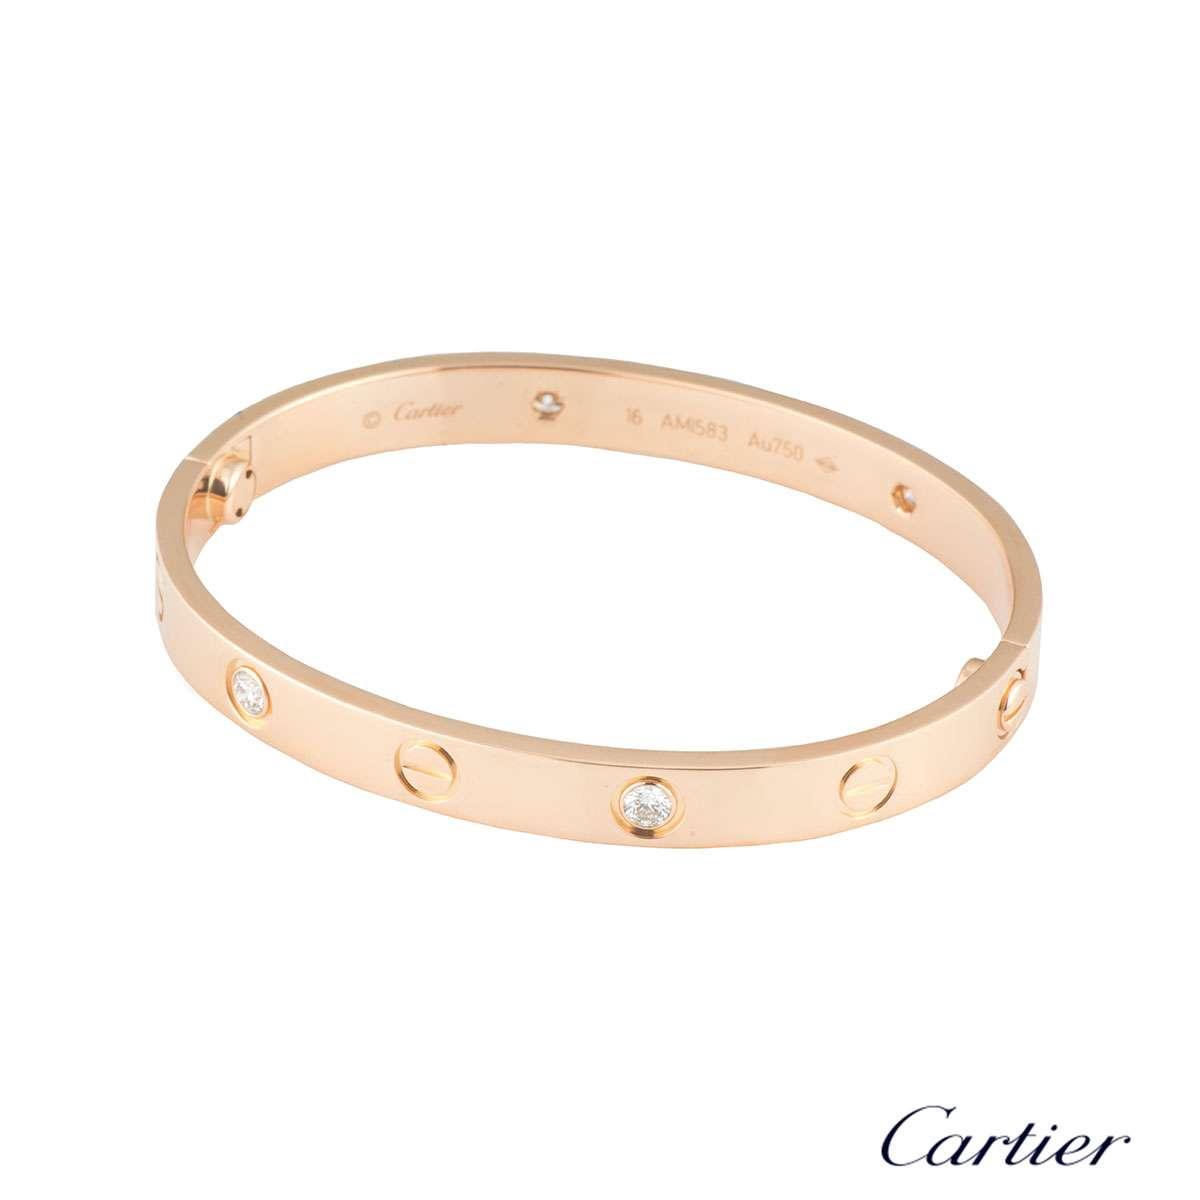 Cartier Infinity Bracelet: Cartier Love Bracelet Rose Gold Half Diamond Size 18